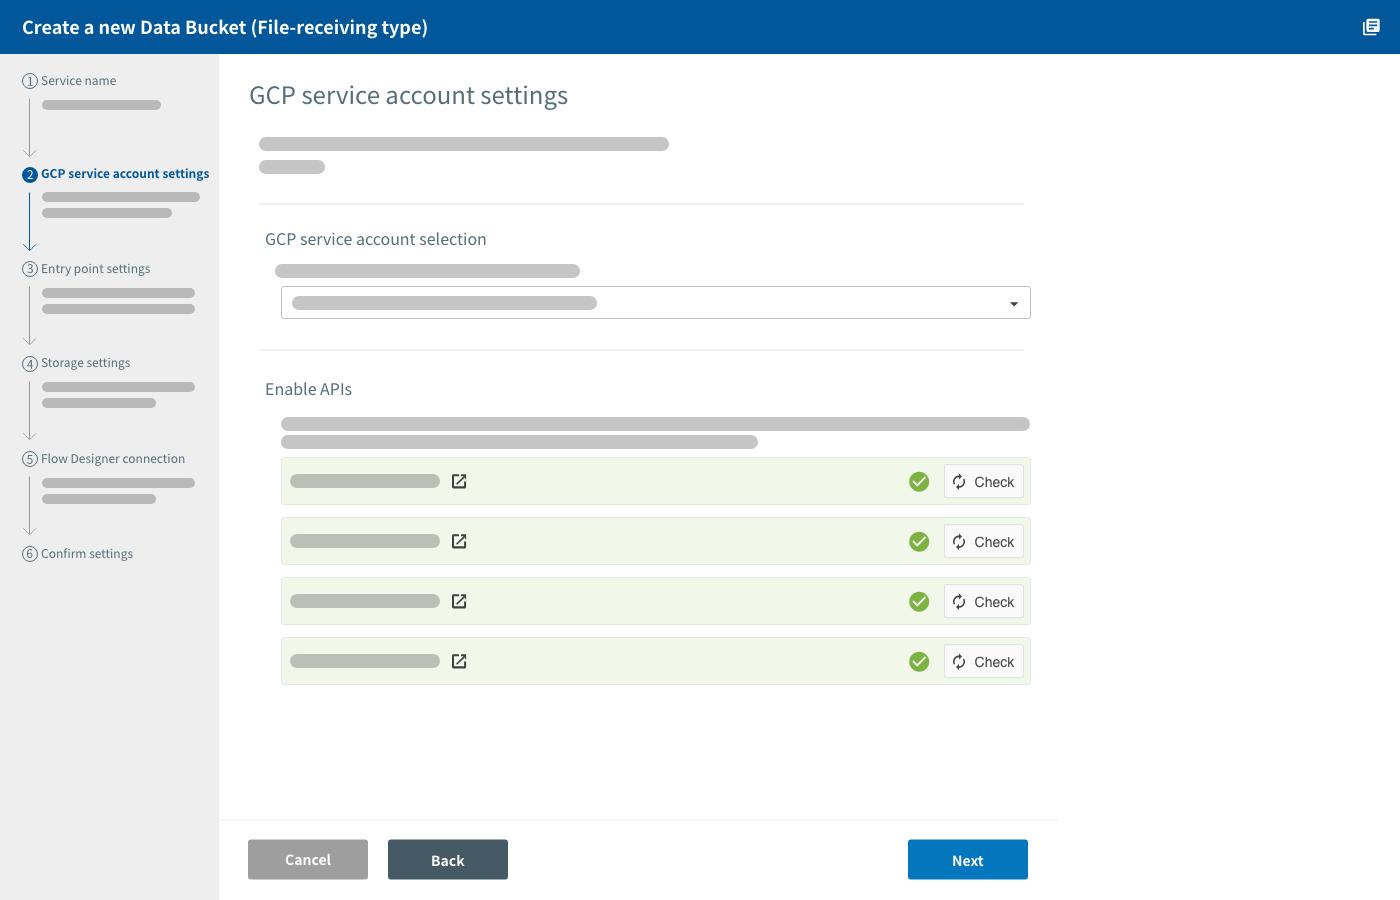 GCP service account setting